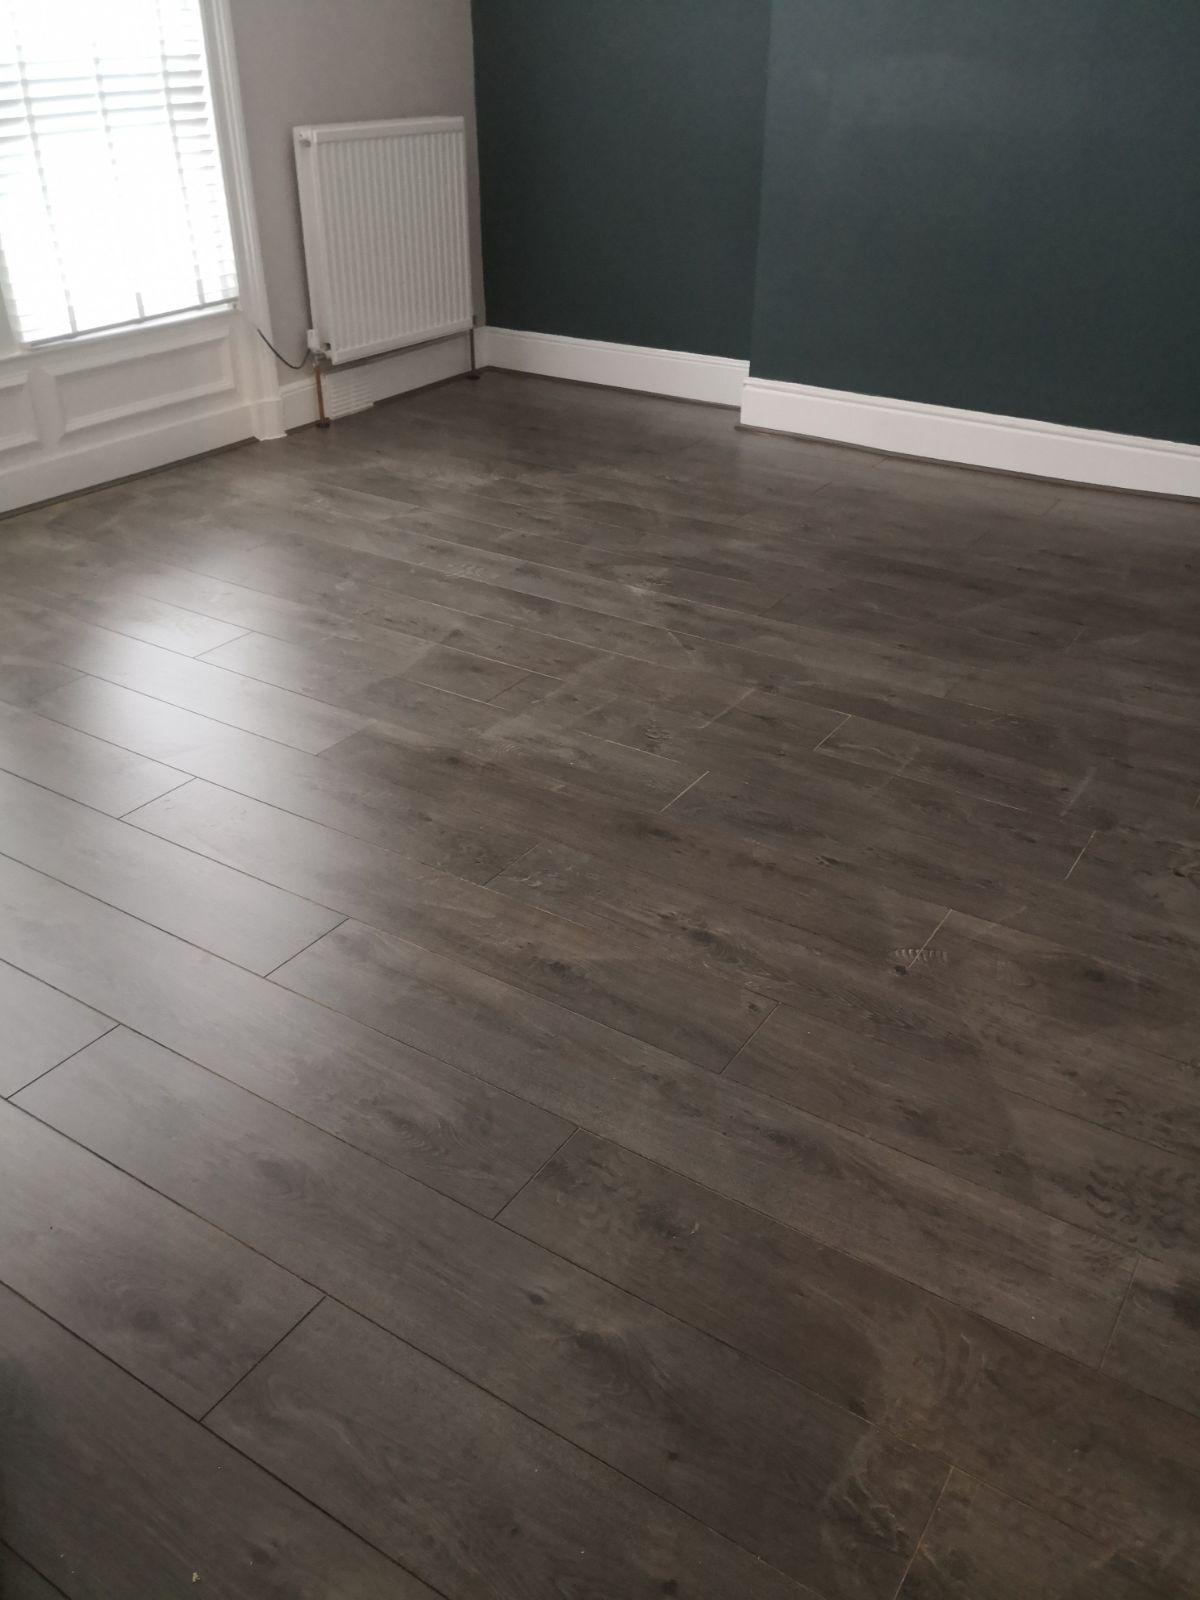 Ground Floor Laminate Flooring Installation  The Carpet